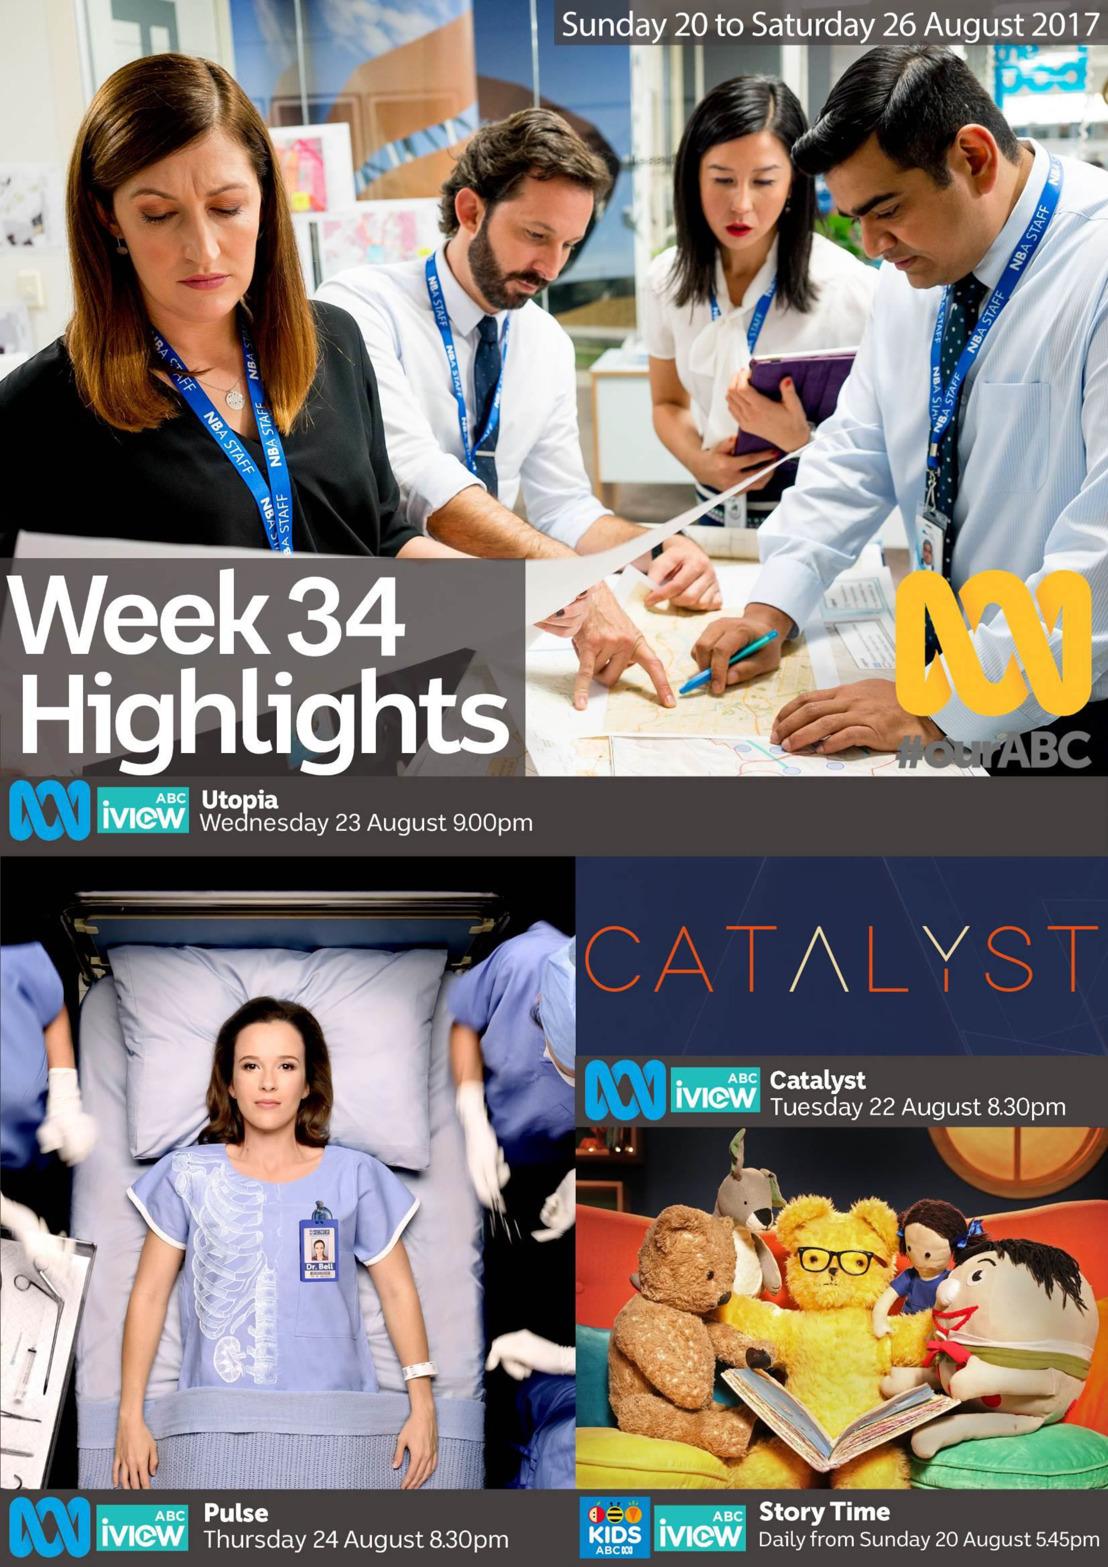 ABC Program Highlights - Week 34